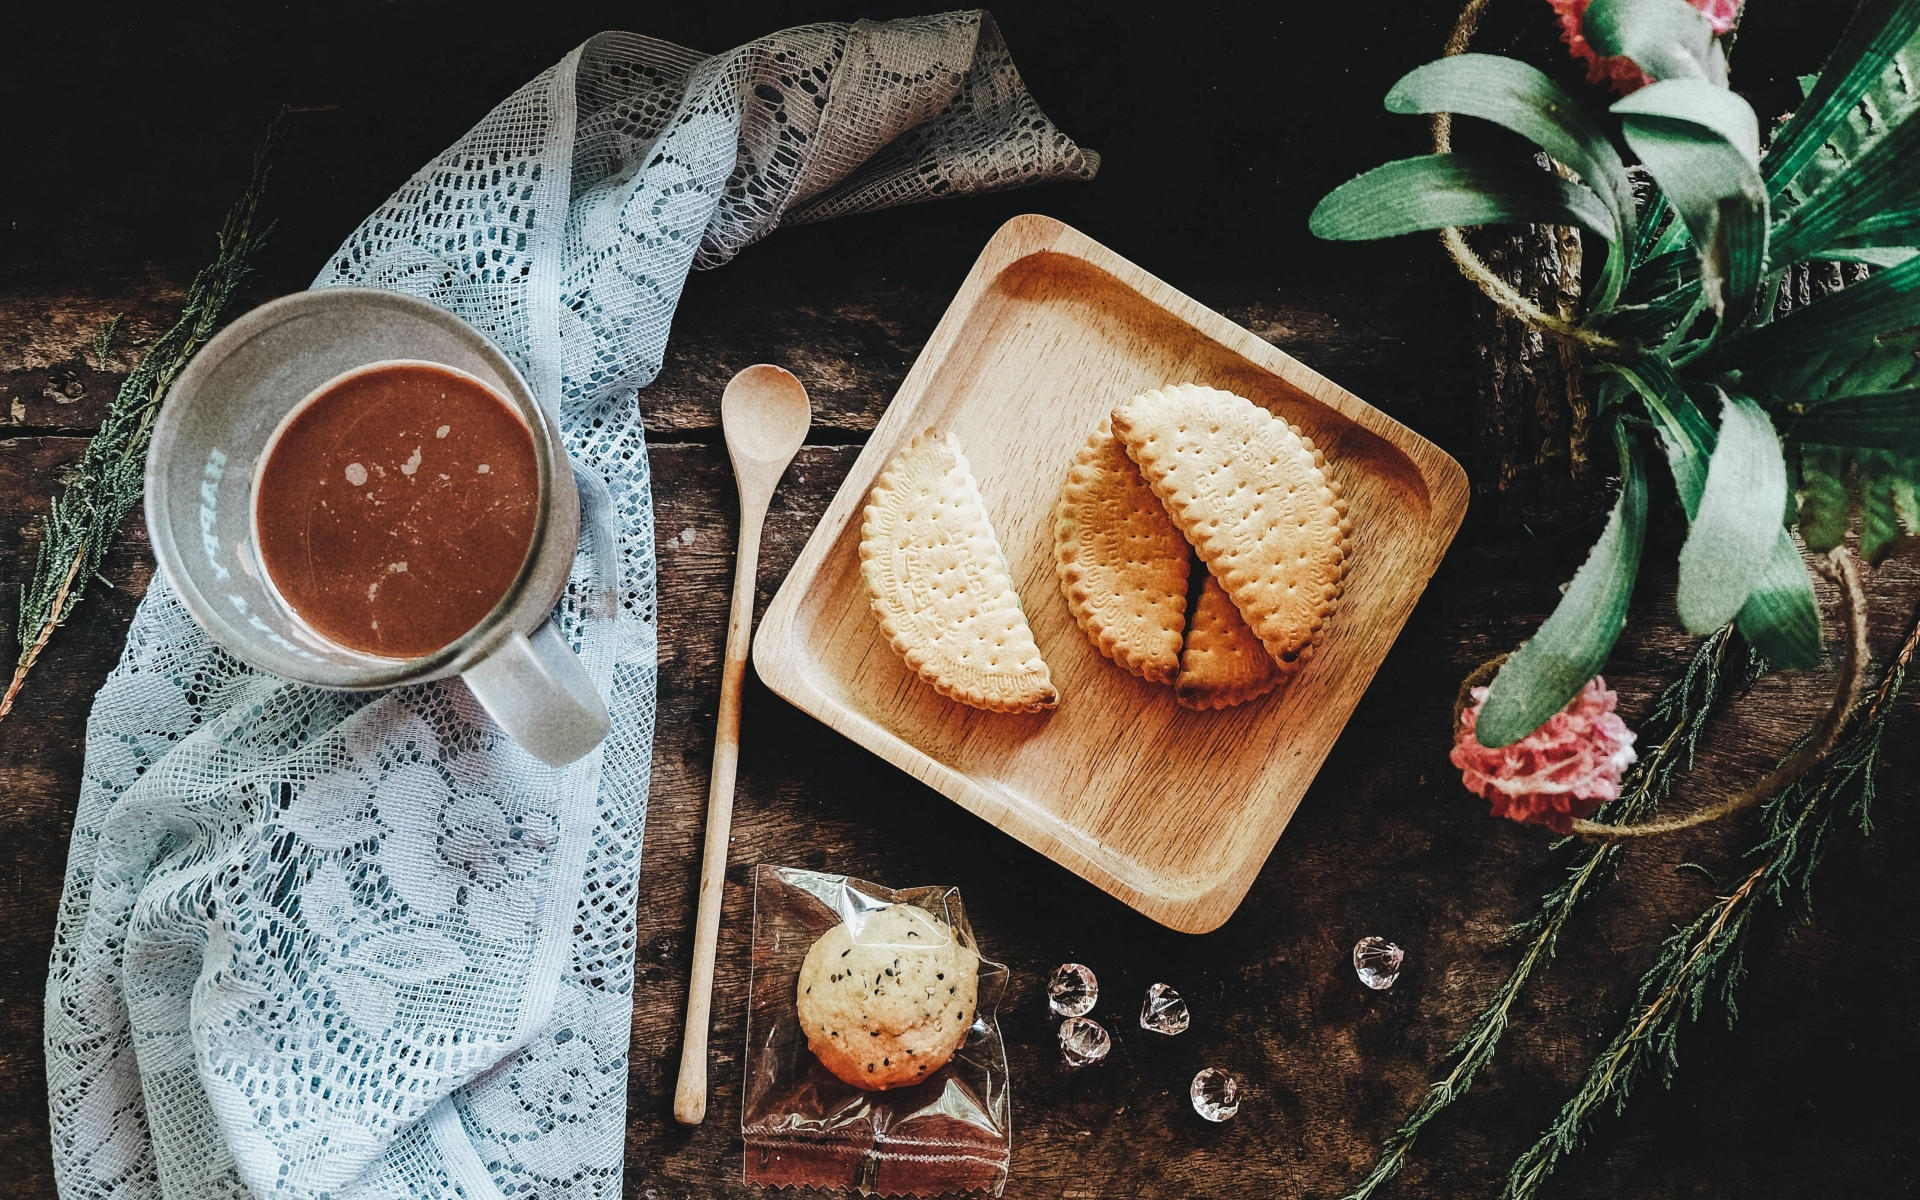 Картинки Печенье, напиток, натюрморт фото и обои на рабочий стол